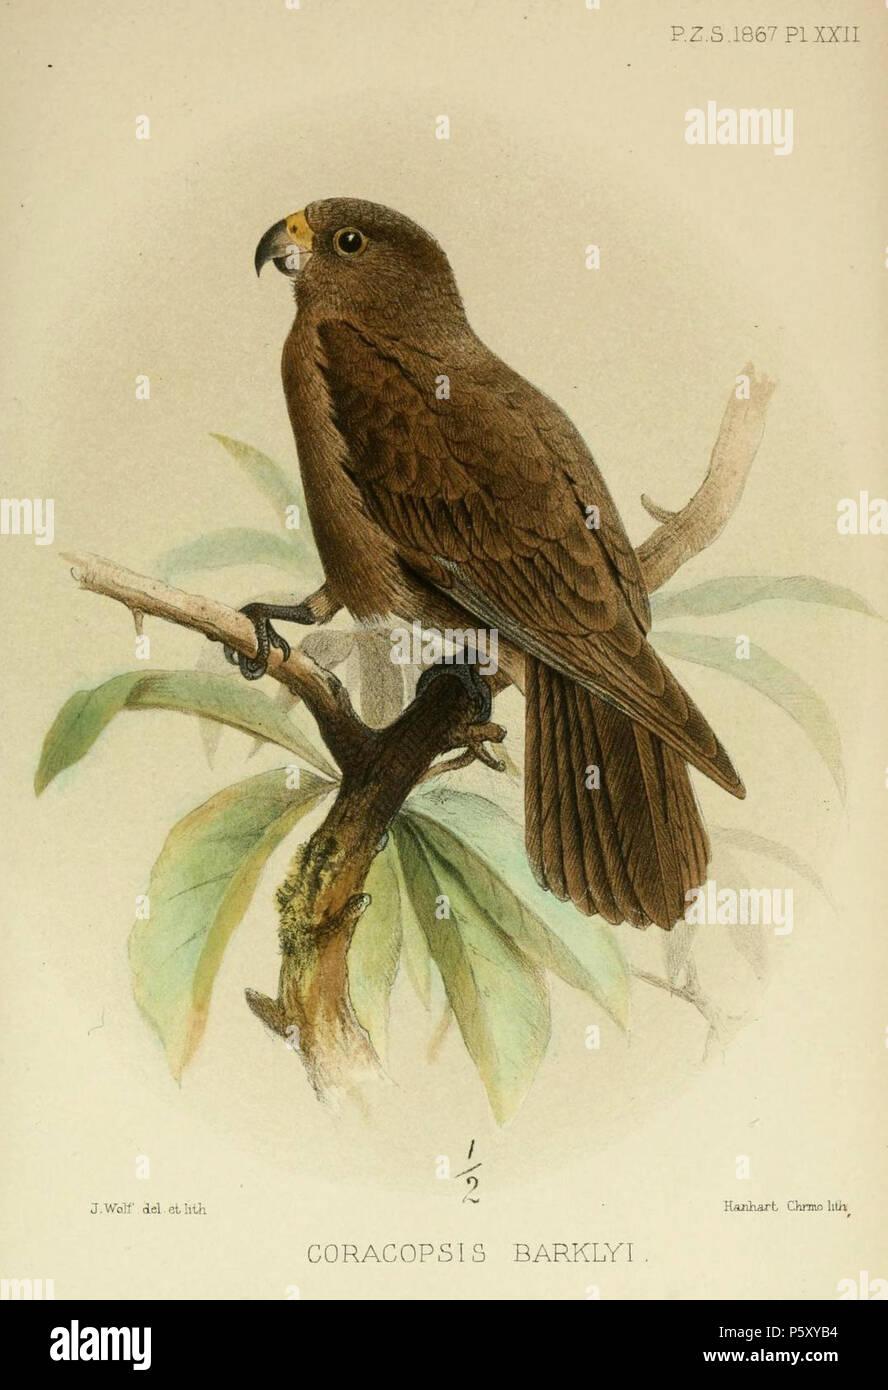 N/A  Coracopsis barklyi (=Coracopsis nigra barklyi)   1867